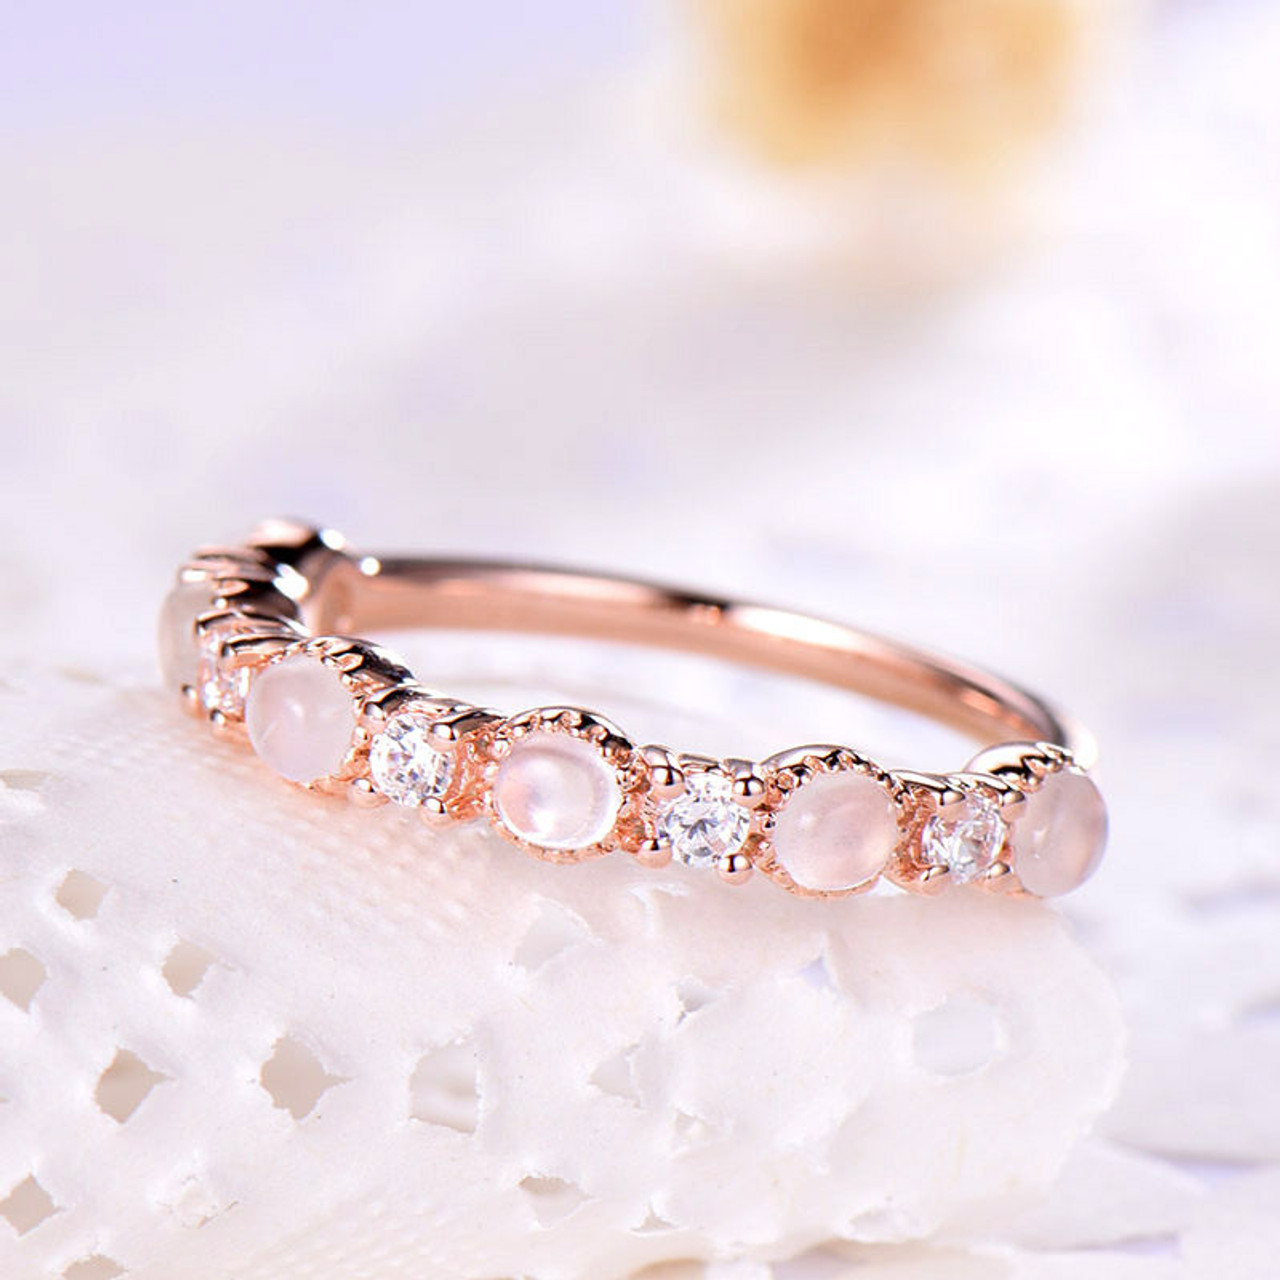 Moonstone Wedding Band Rose Gold Moonstone Ring Jewelry Bbbgem